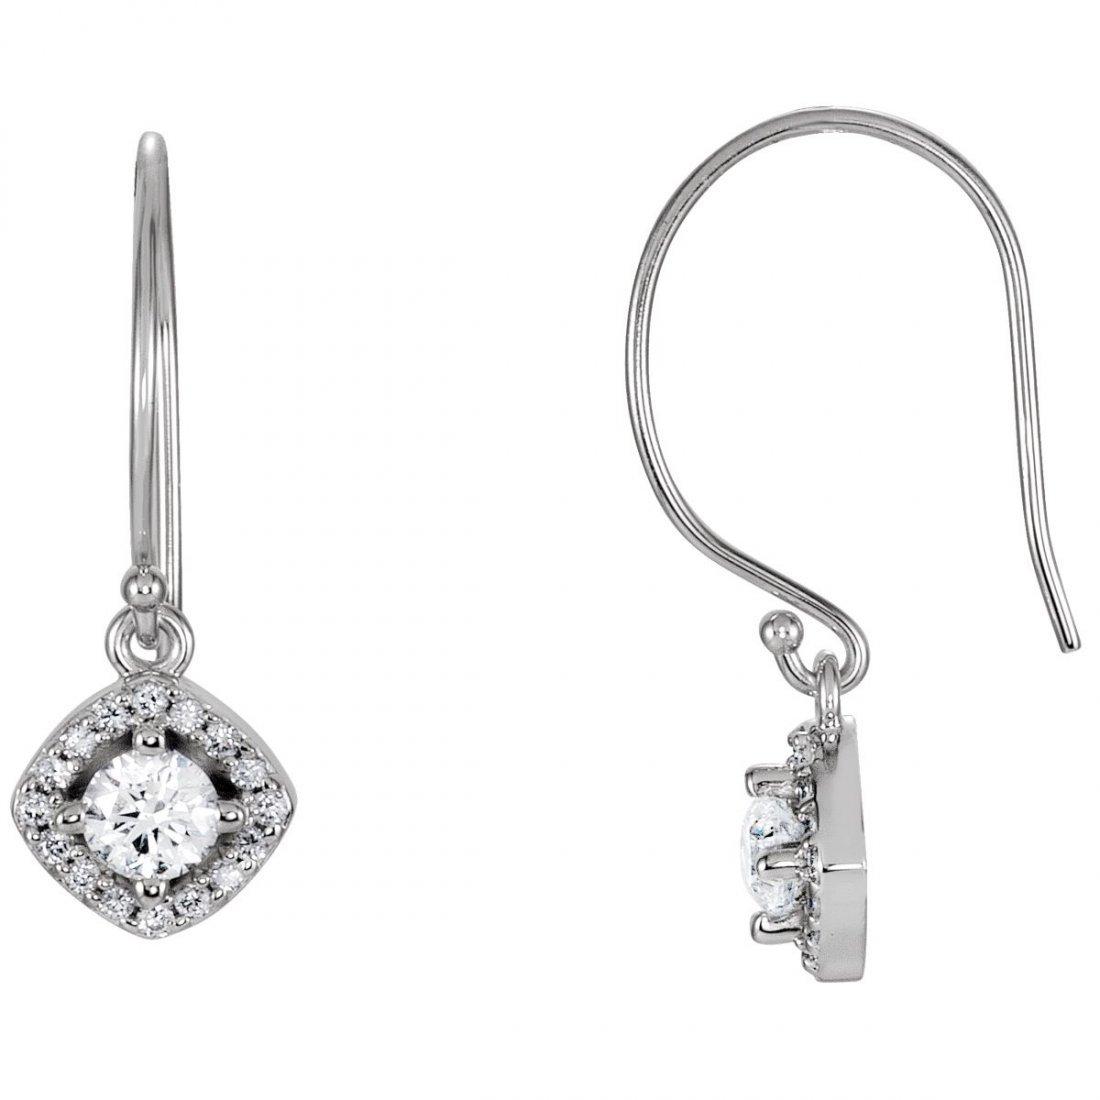 Earrings - 14k White Gold 5/8 CTW Diamond Earrings